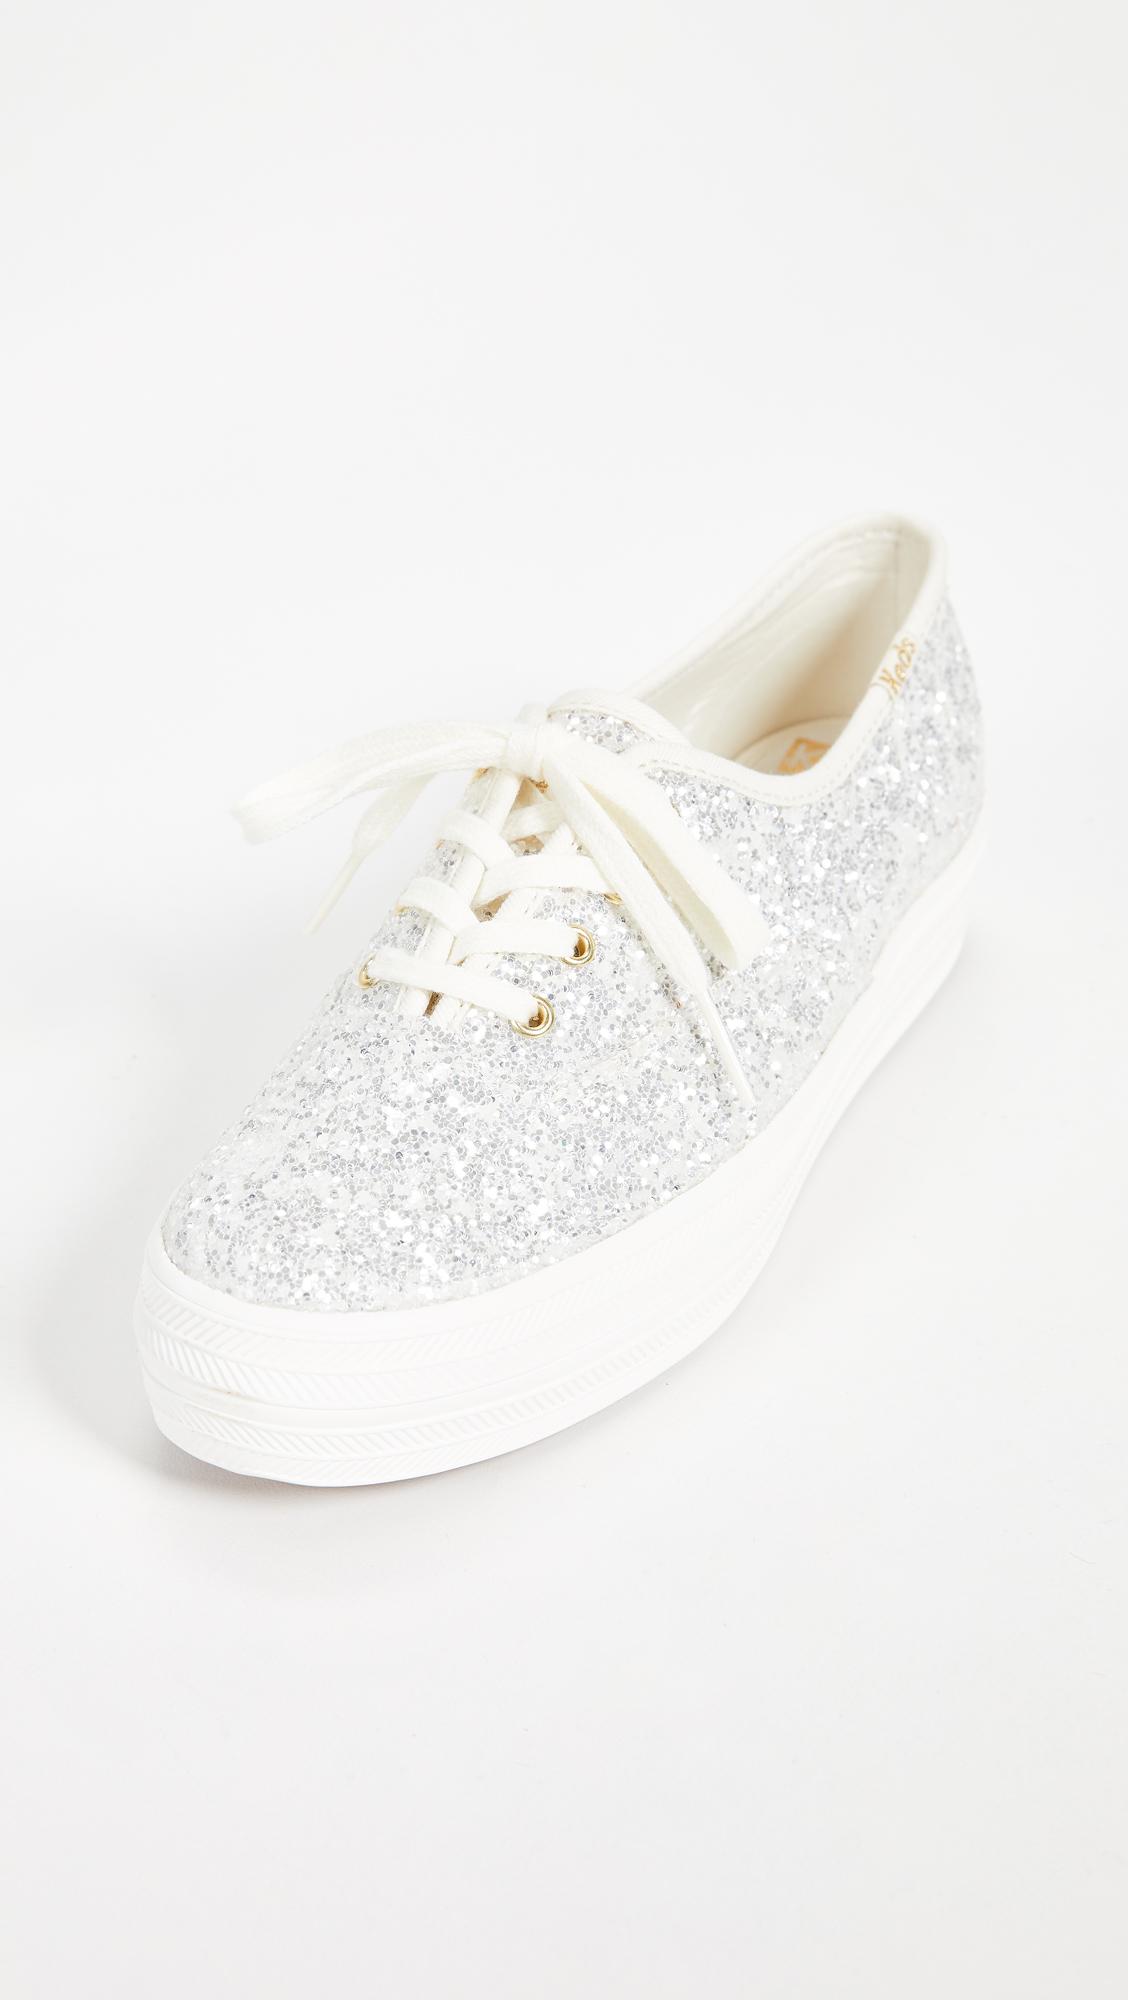 71636c1072f Keds x Kate Spade New York Triple Sneakers